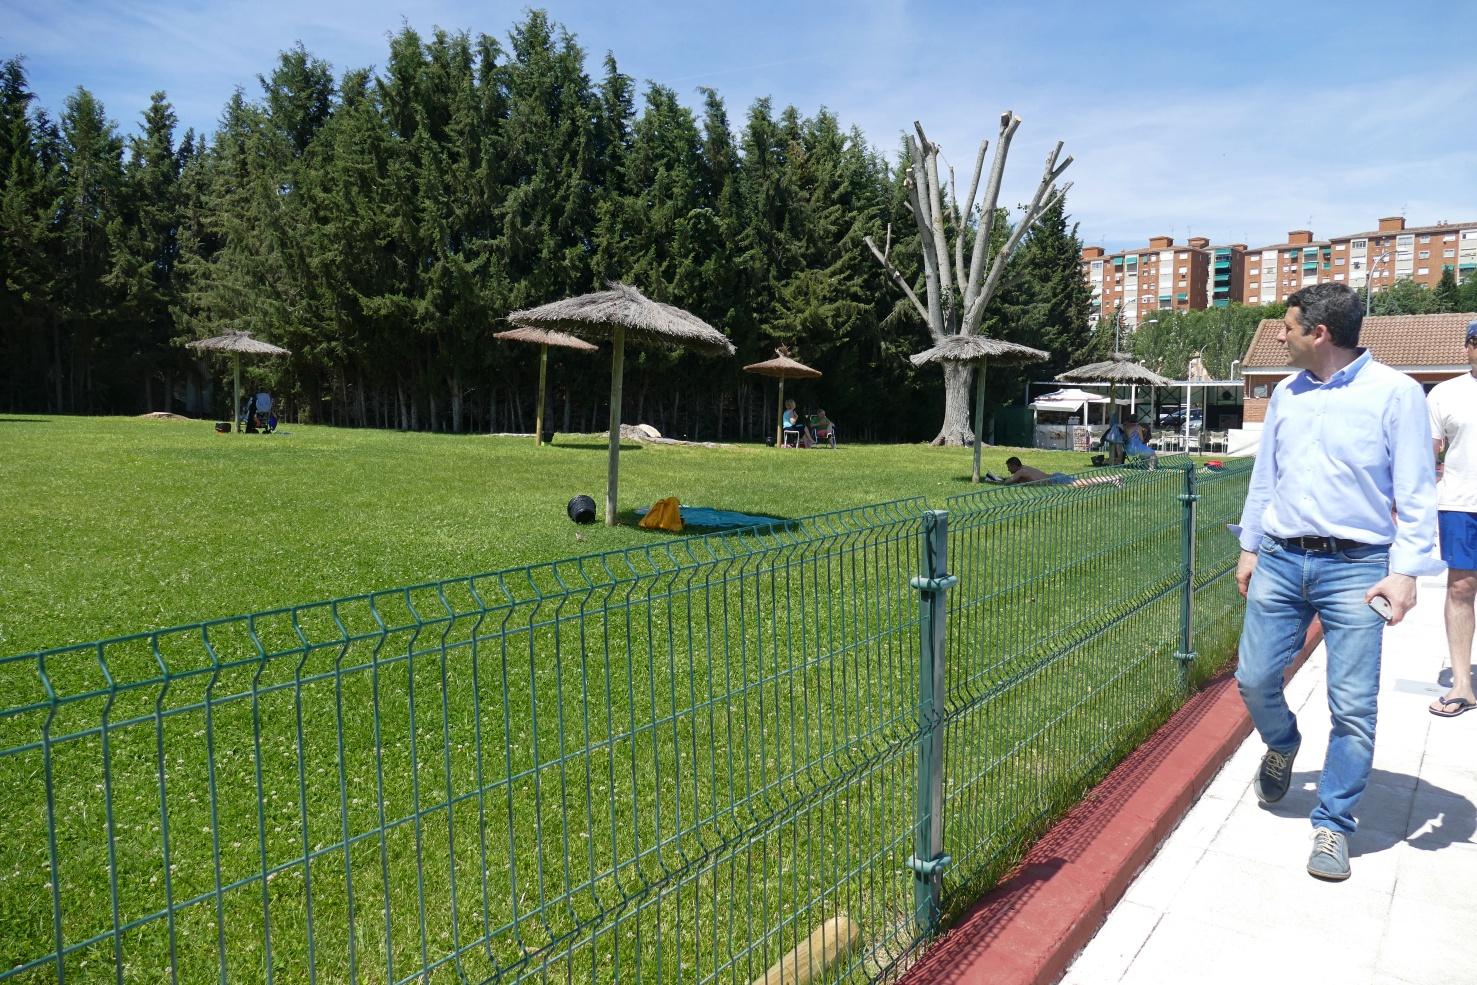 Esteban pa os reclama accesibilidad real en todas las piscinas municipales de toledo - Piscina municipal toledo ...